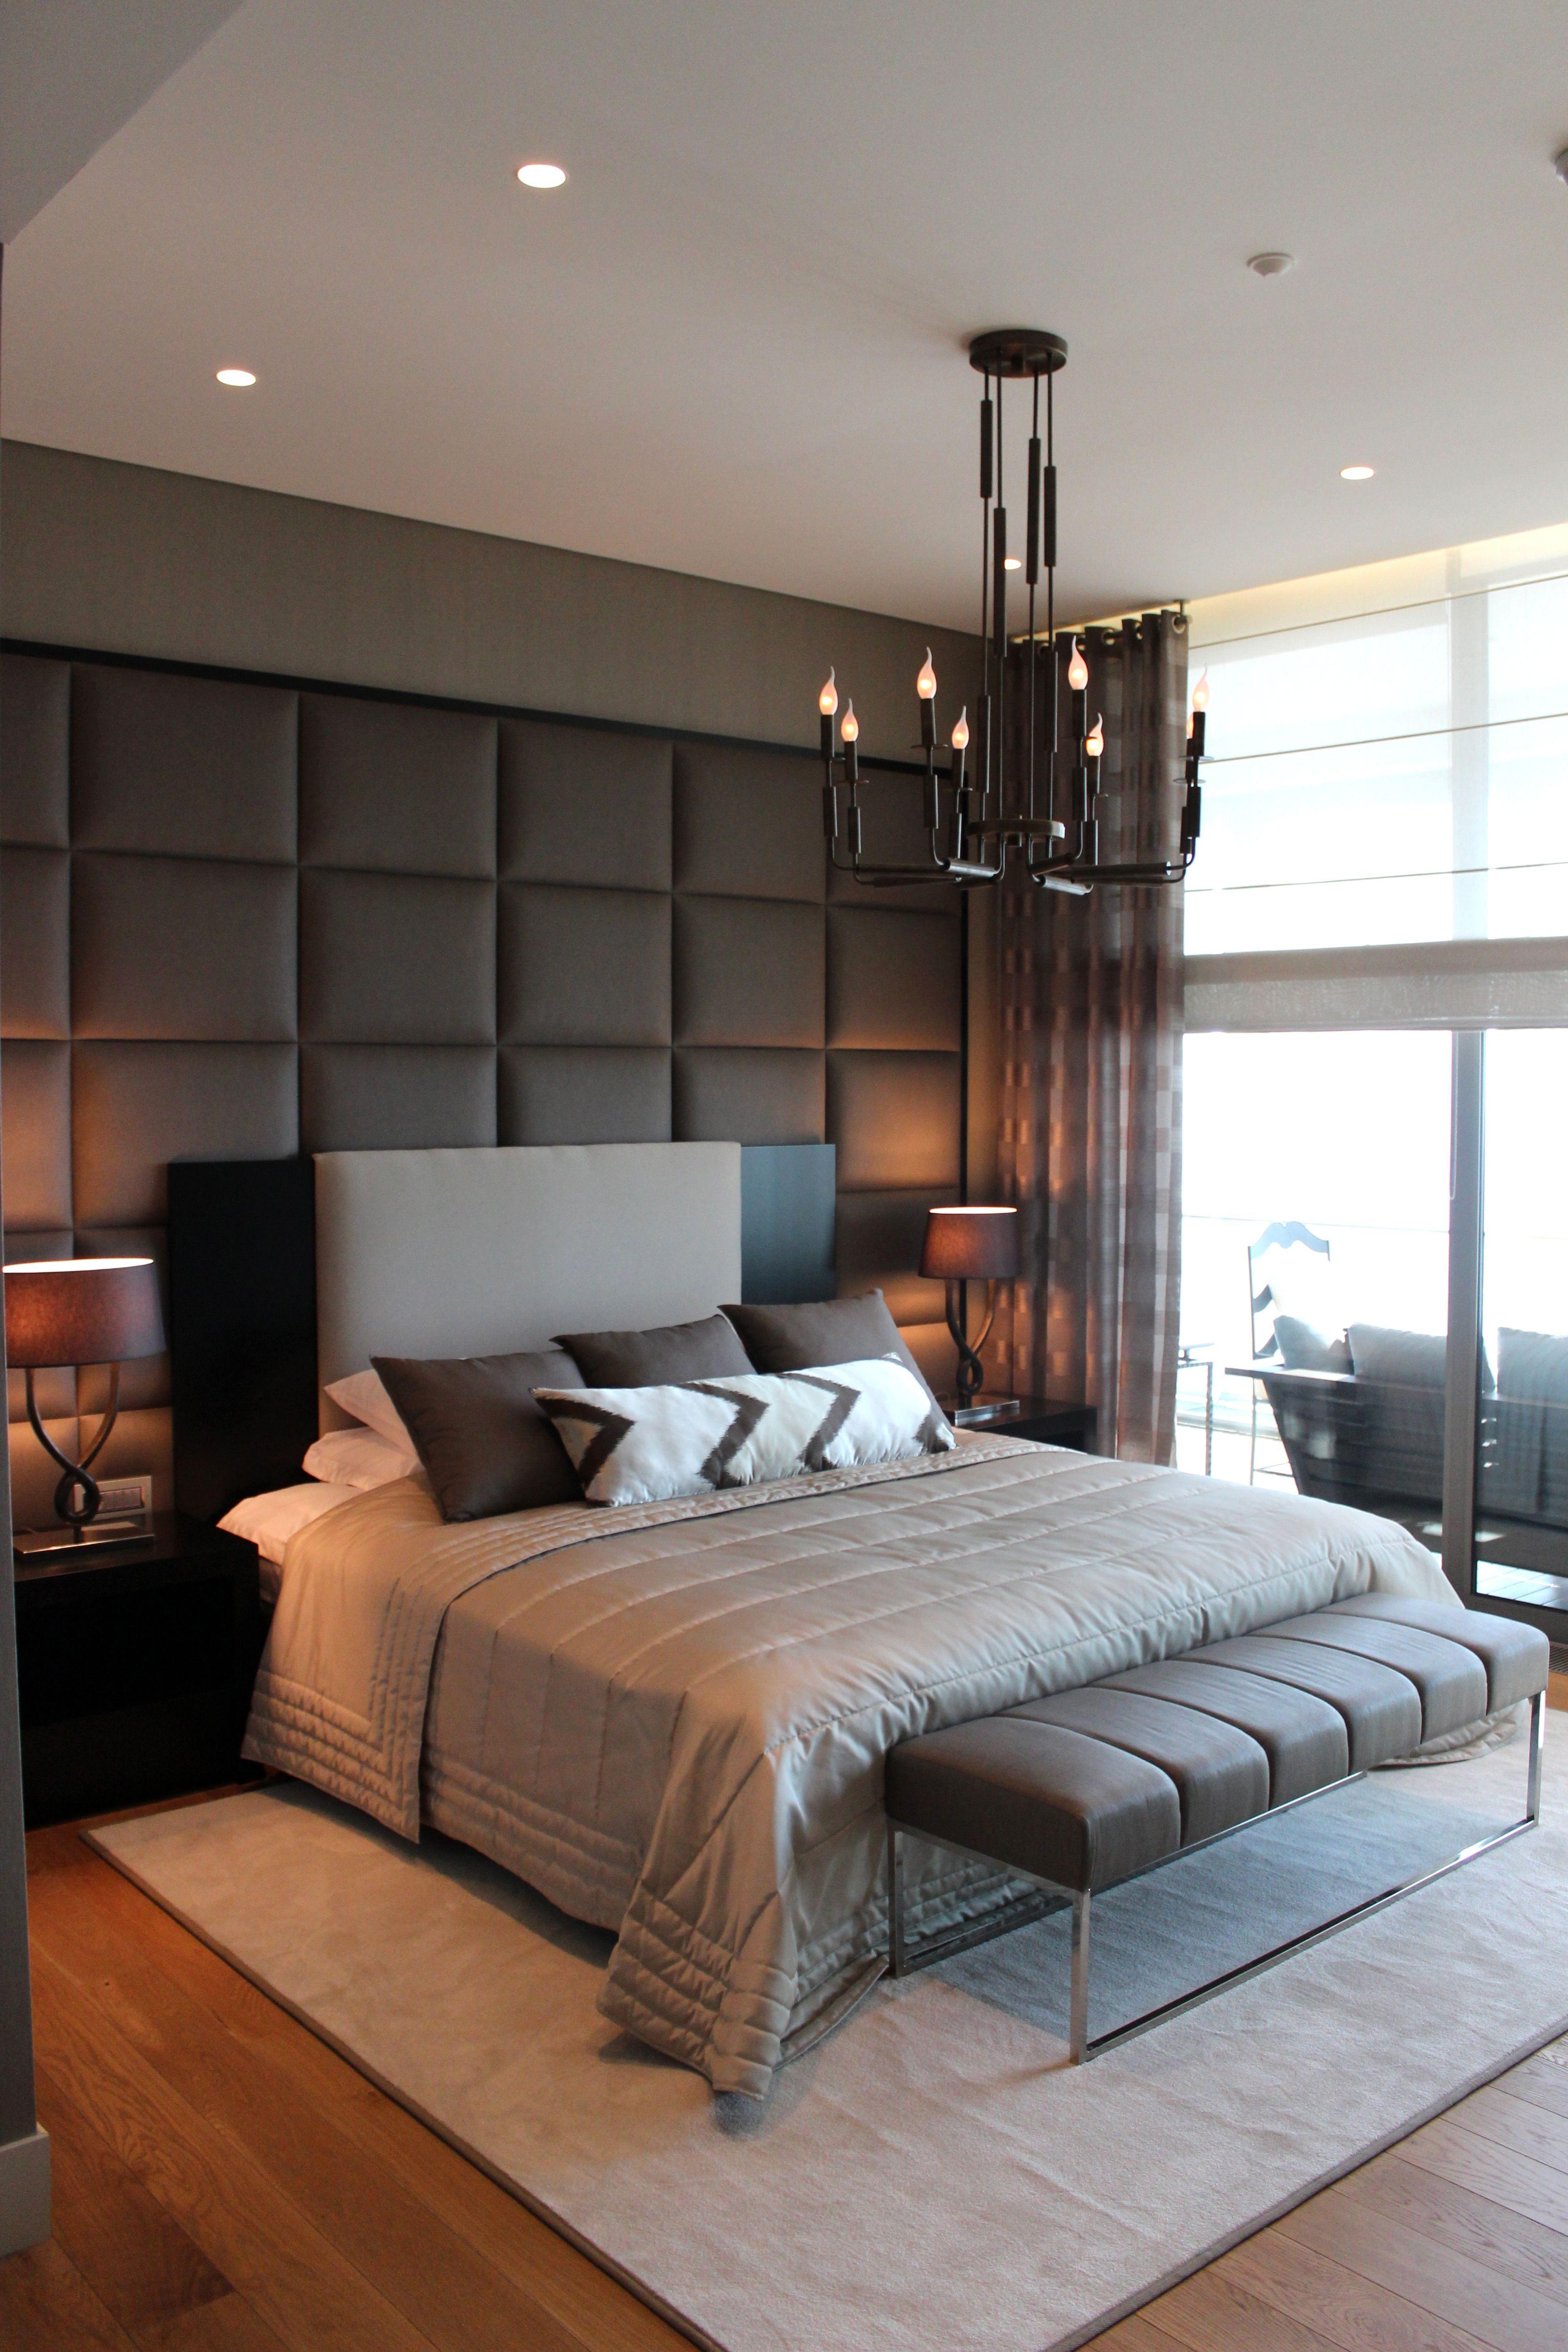 Tete De Lit Murale Meilleur De Modern Bedroom Mbr Pinterest